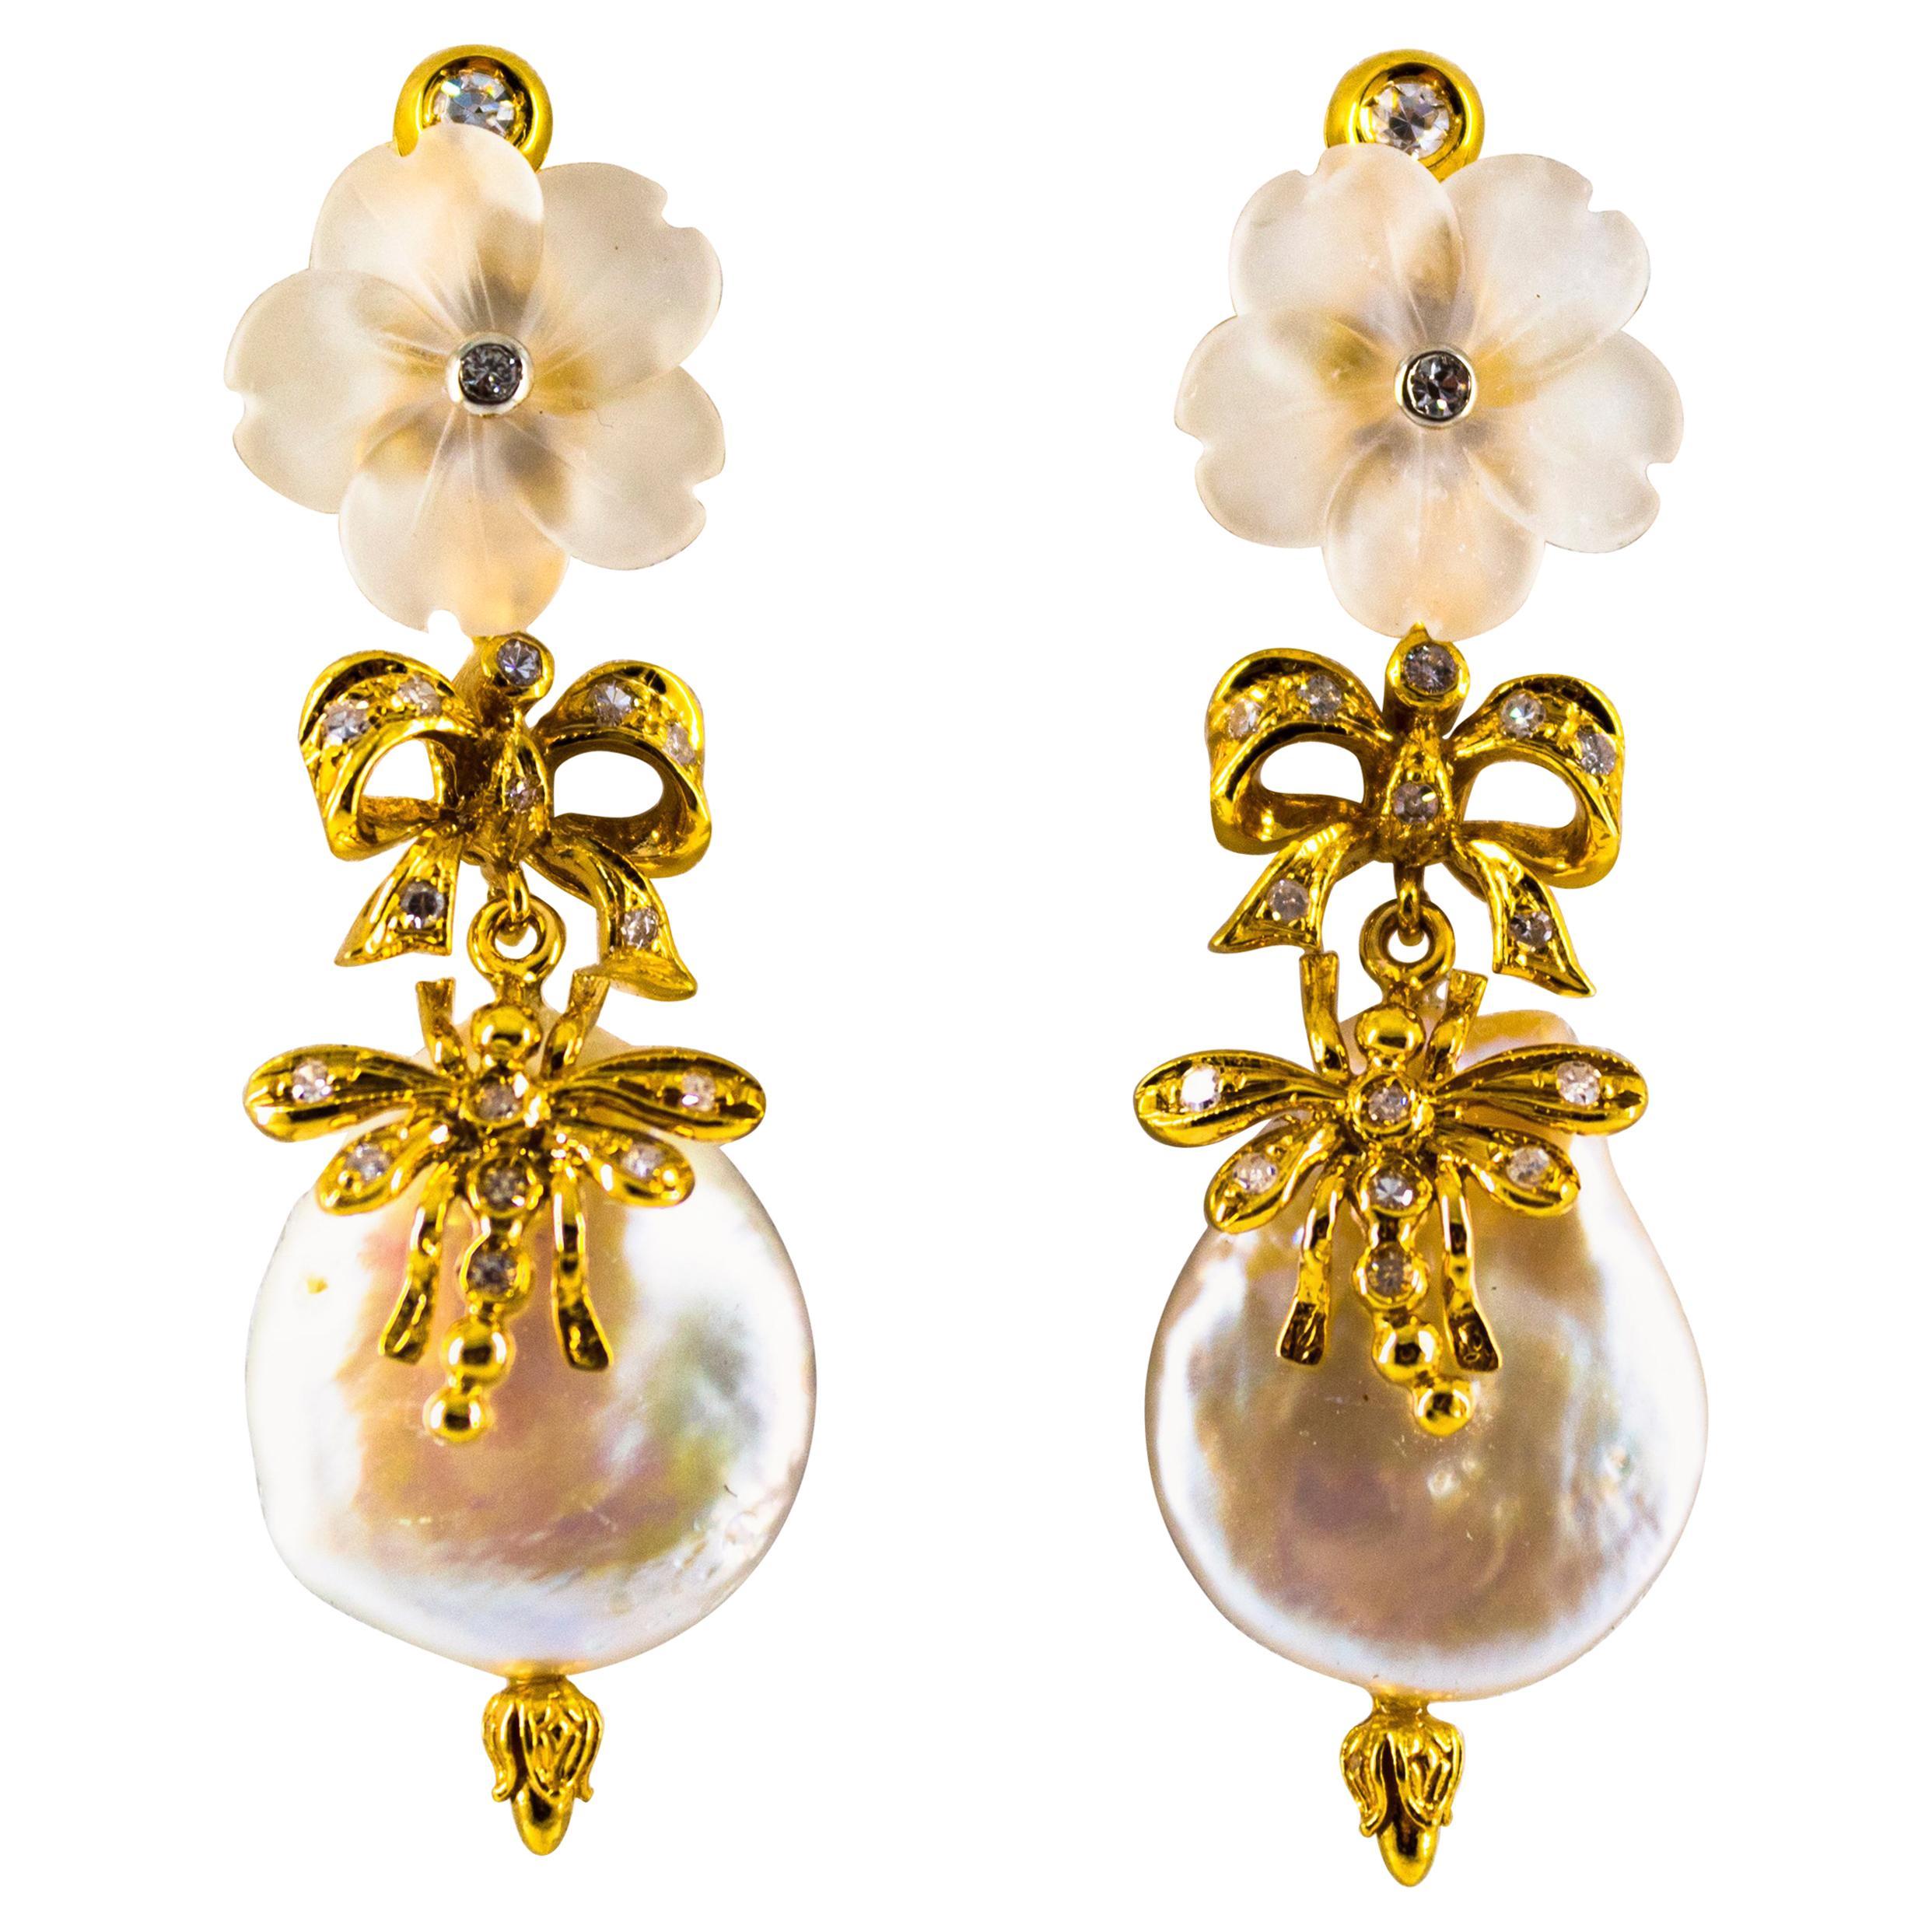 0.40 Carat White Diamond Rock Crystal Pearl Yellow Gold Drop Stud Earrings